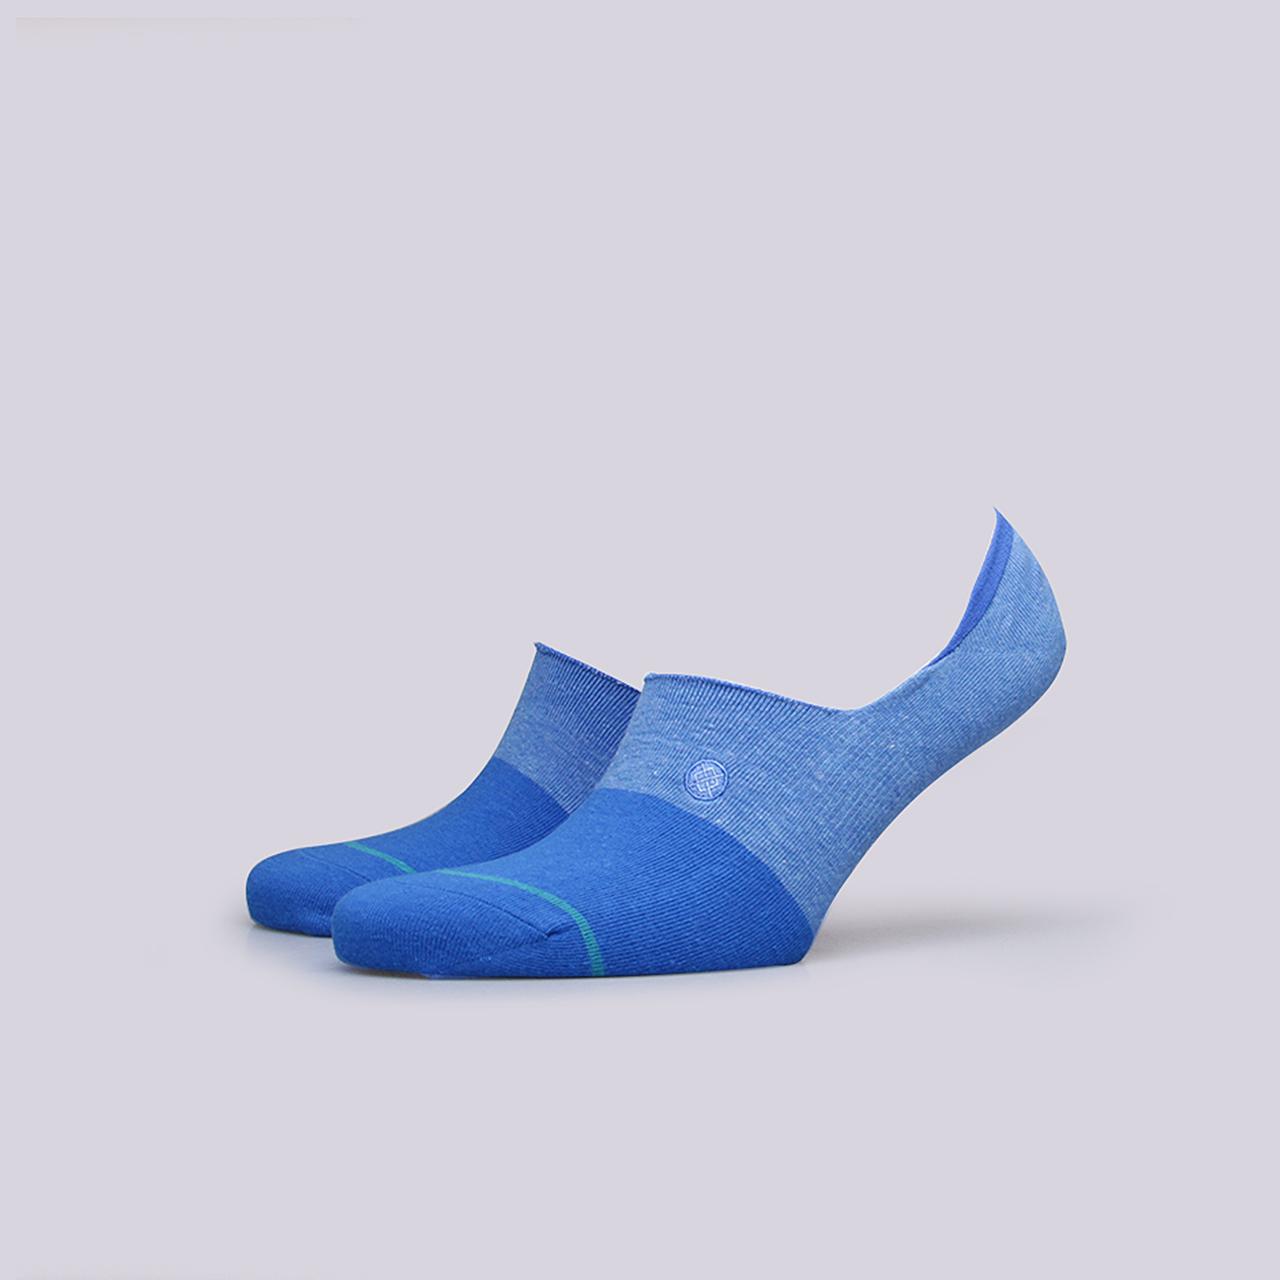 Носки Stance Spectrum SuperНоски<br>хлопок, эластан<br><br>Цвет: Синий<br>Размеры : L<br>Пол: Мужской